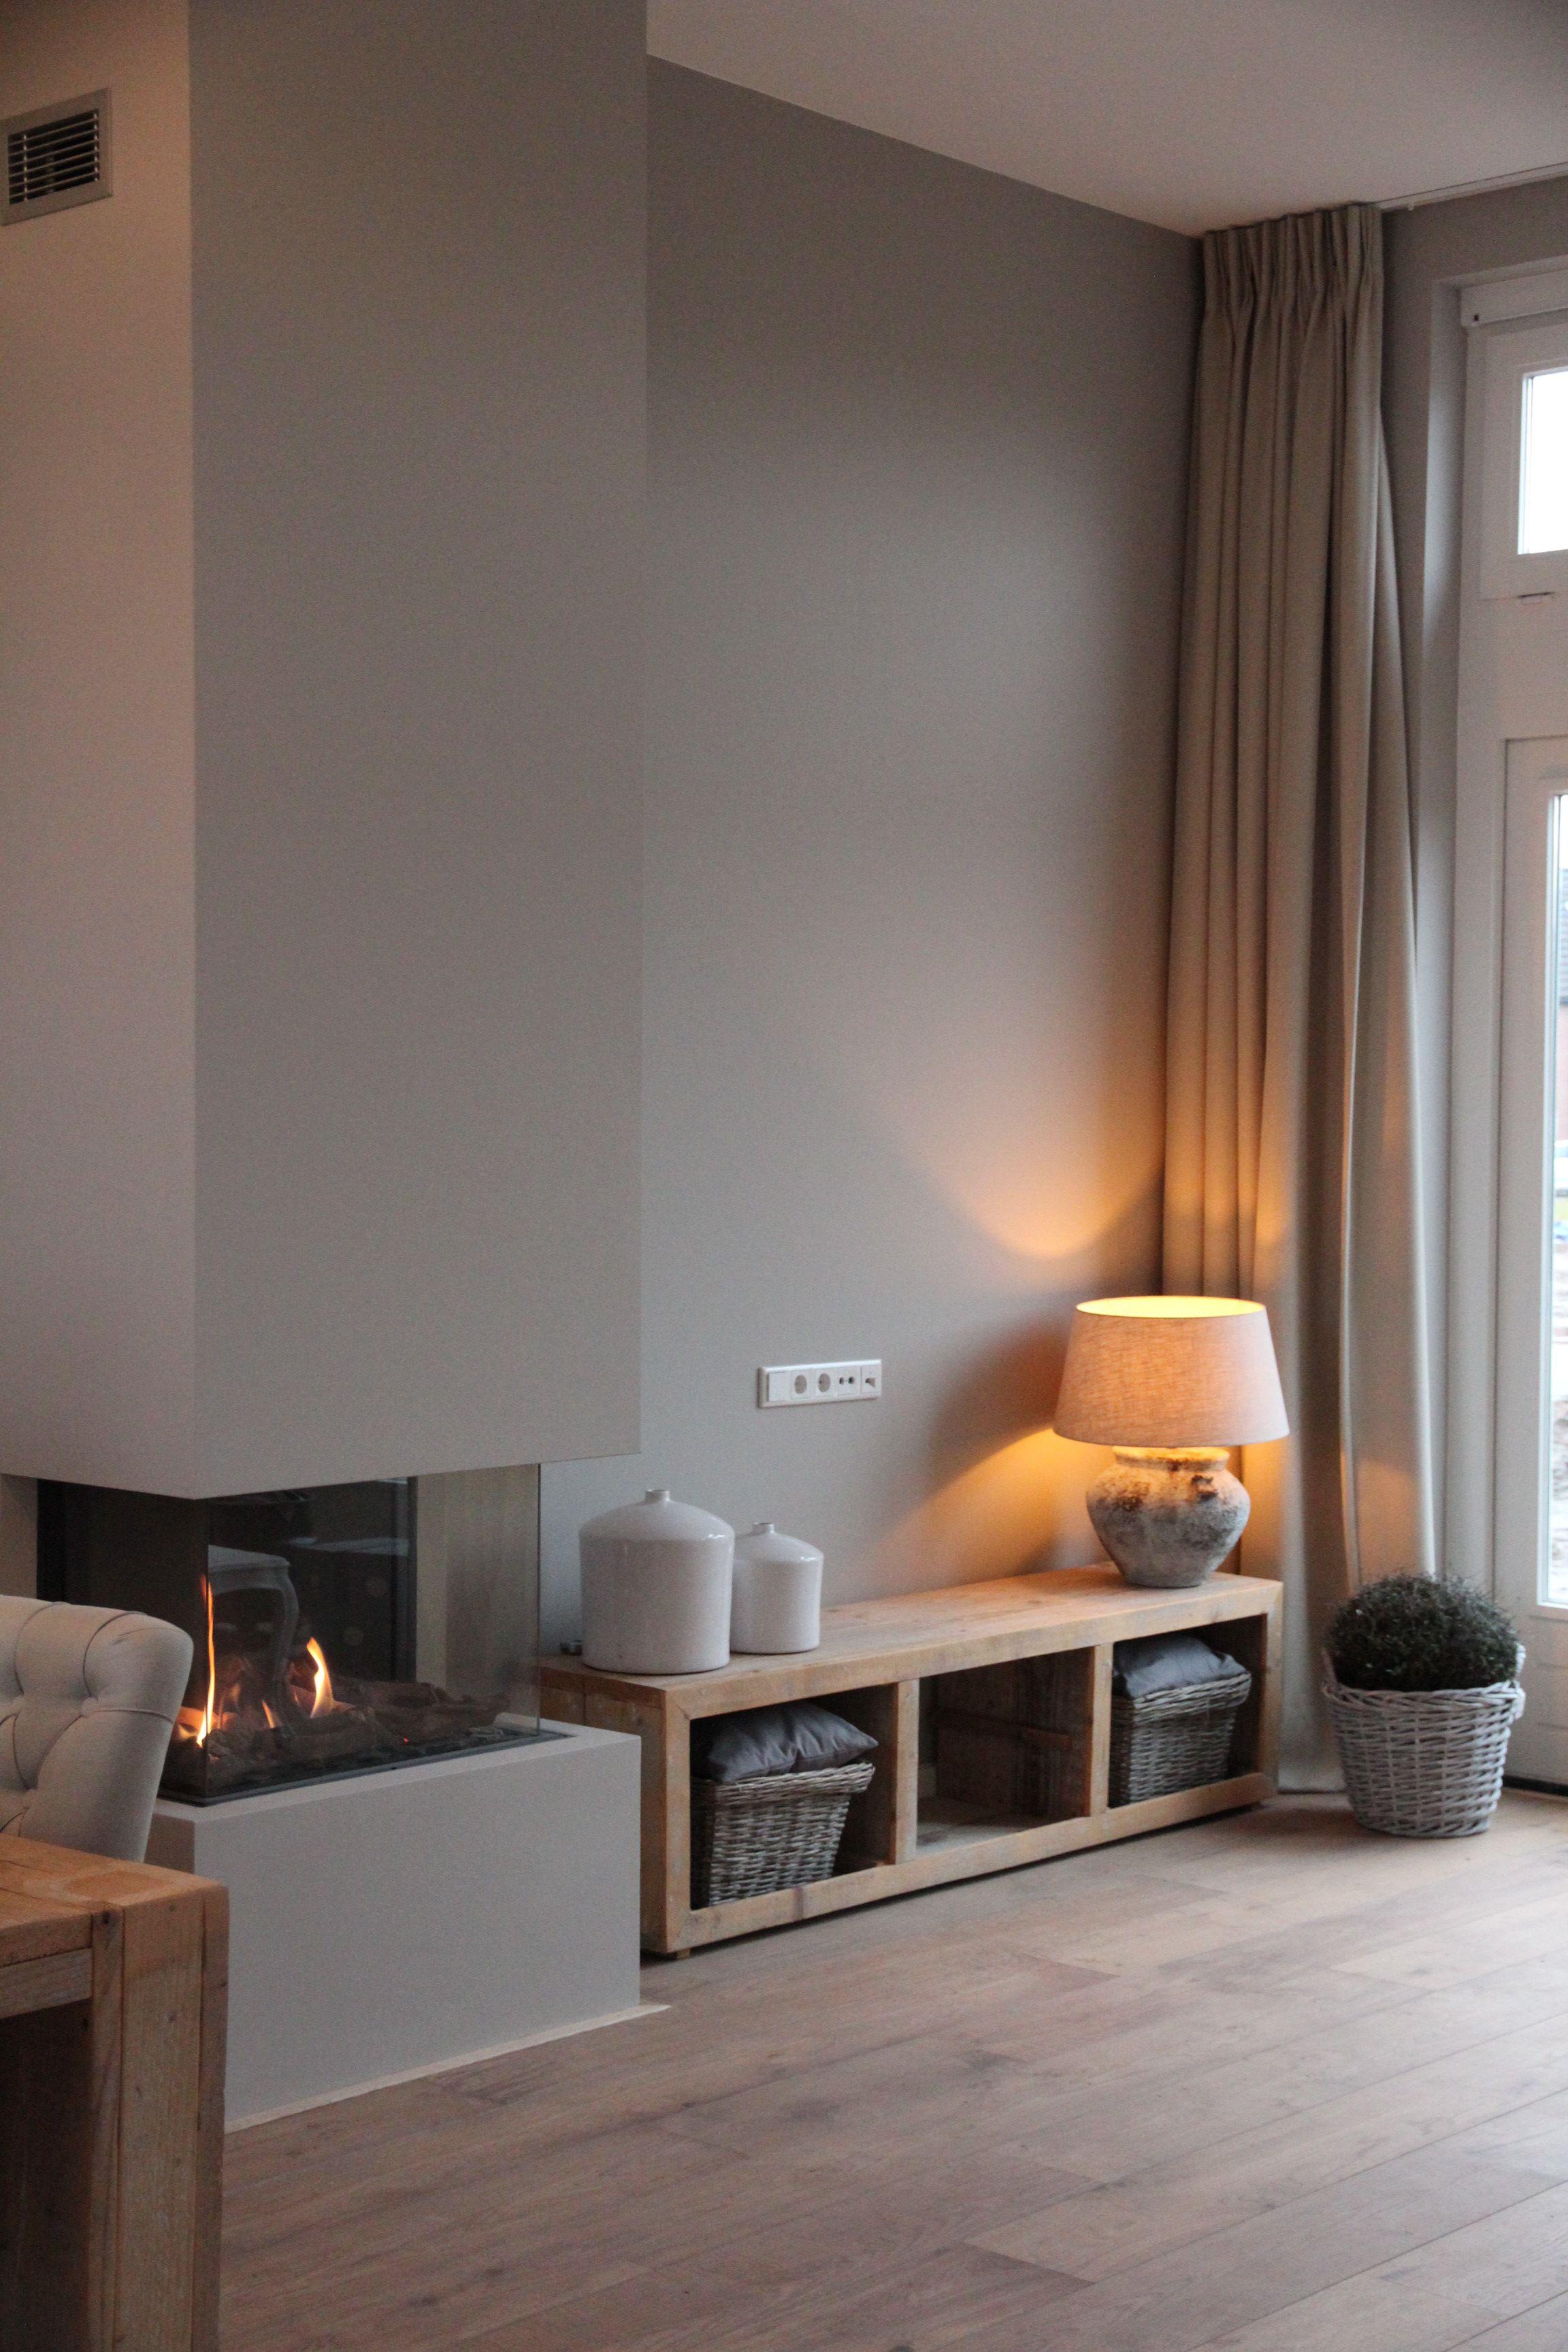 Gashaard in kolom - Home sweet home! | Pinterest - Haard, Gordijnen ...